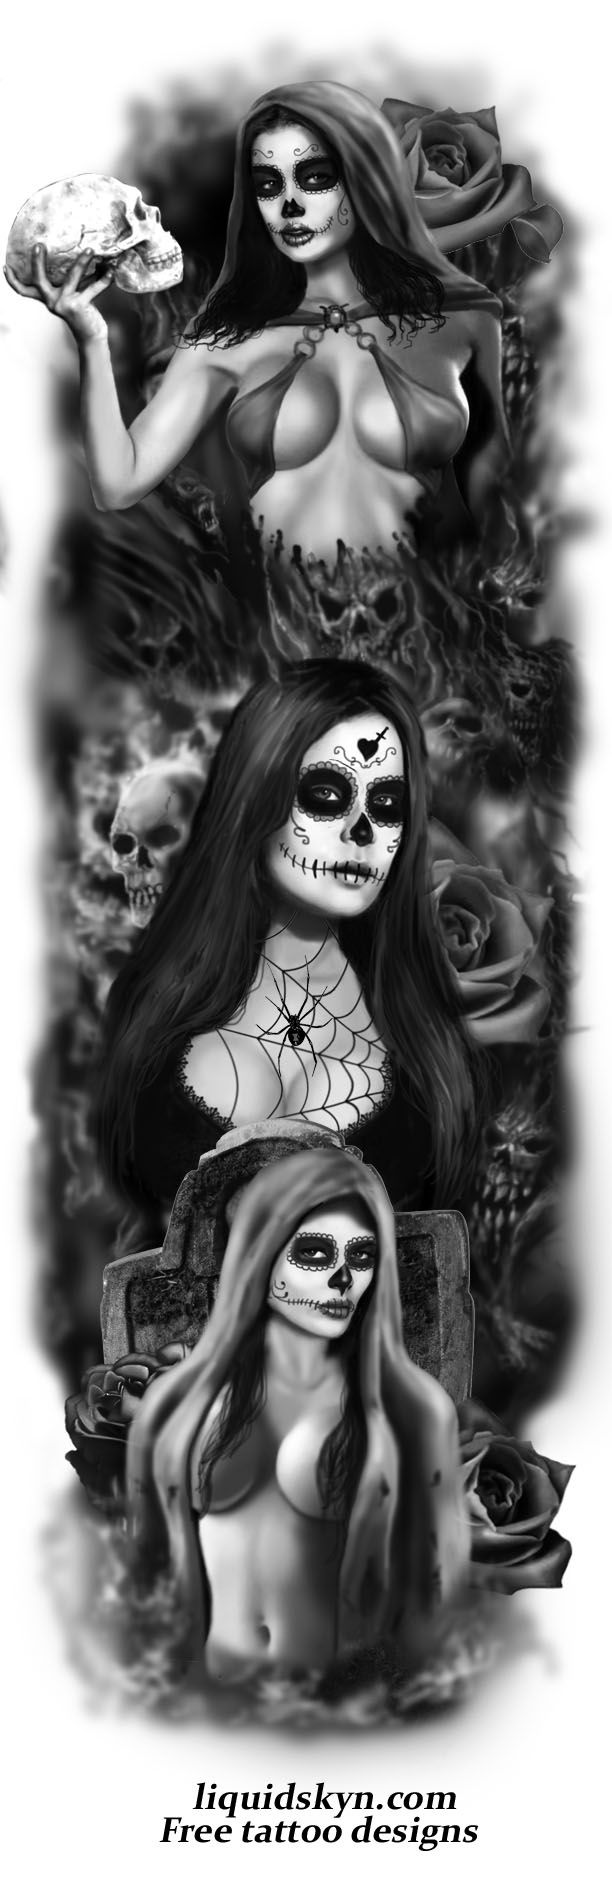 Day Of The Dead Tattoos   DAY OF THE DEAD TATTOO SLEEVE 2